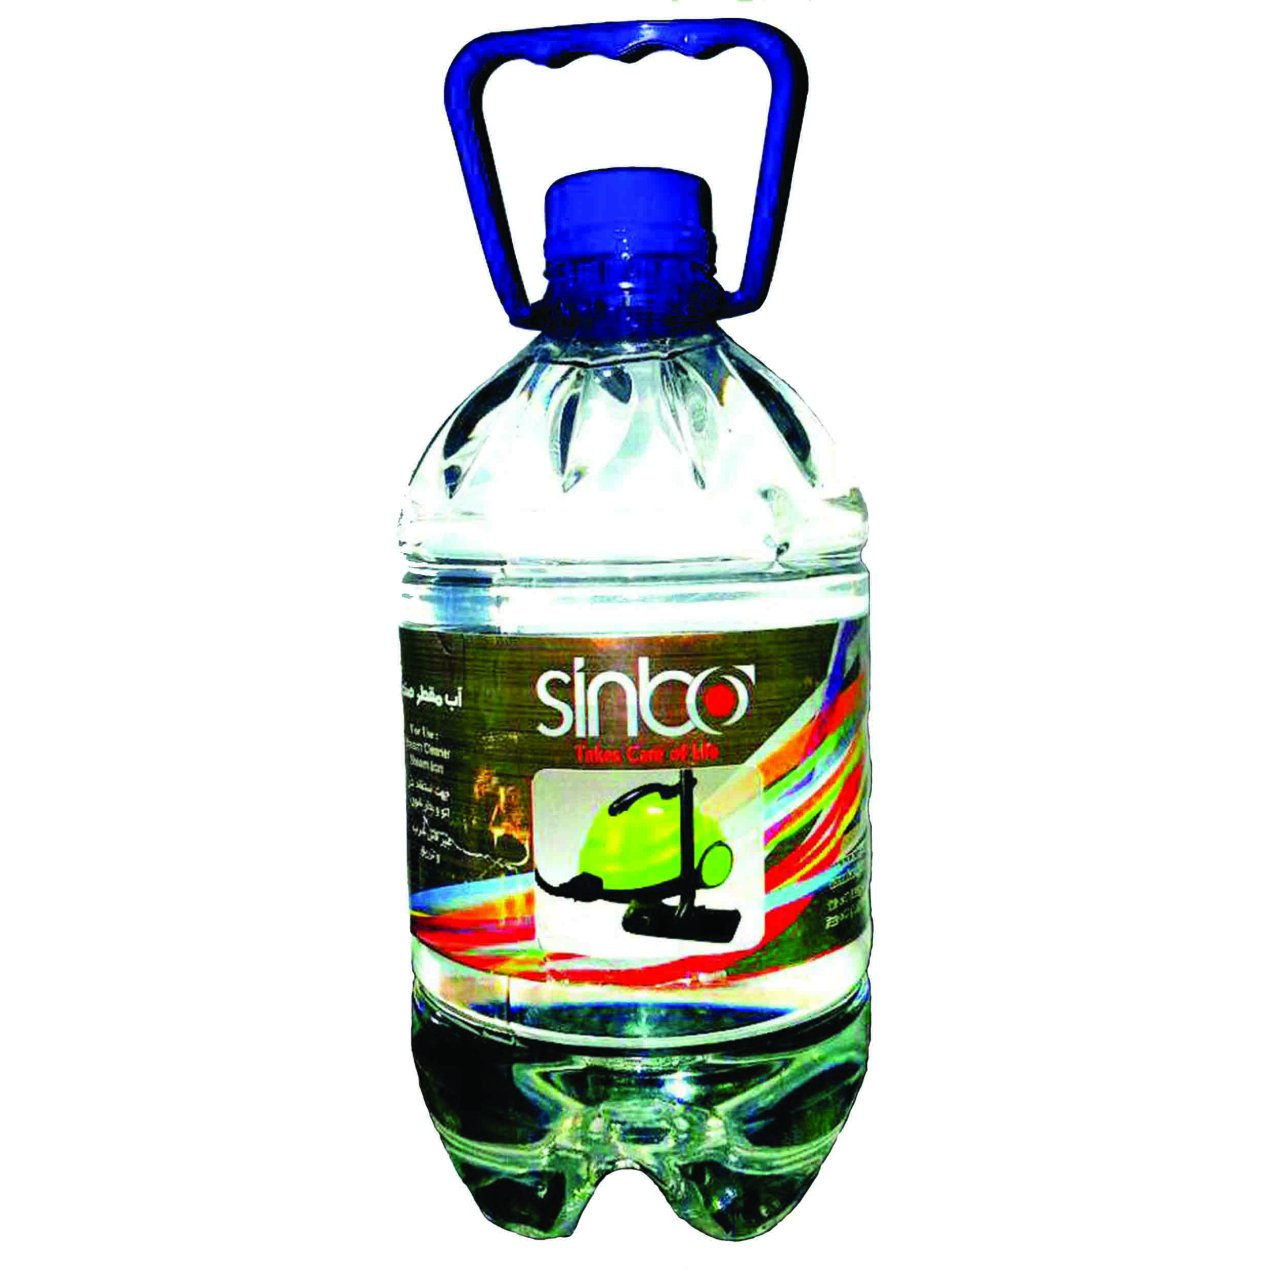 آب مقطر صنعتی Sinbo با حجم 4 لیتر